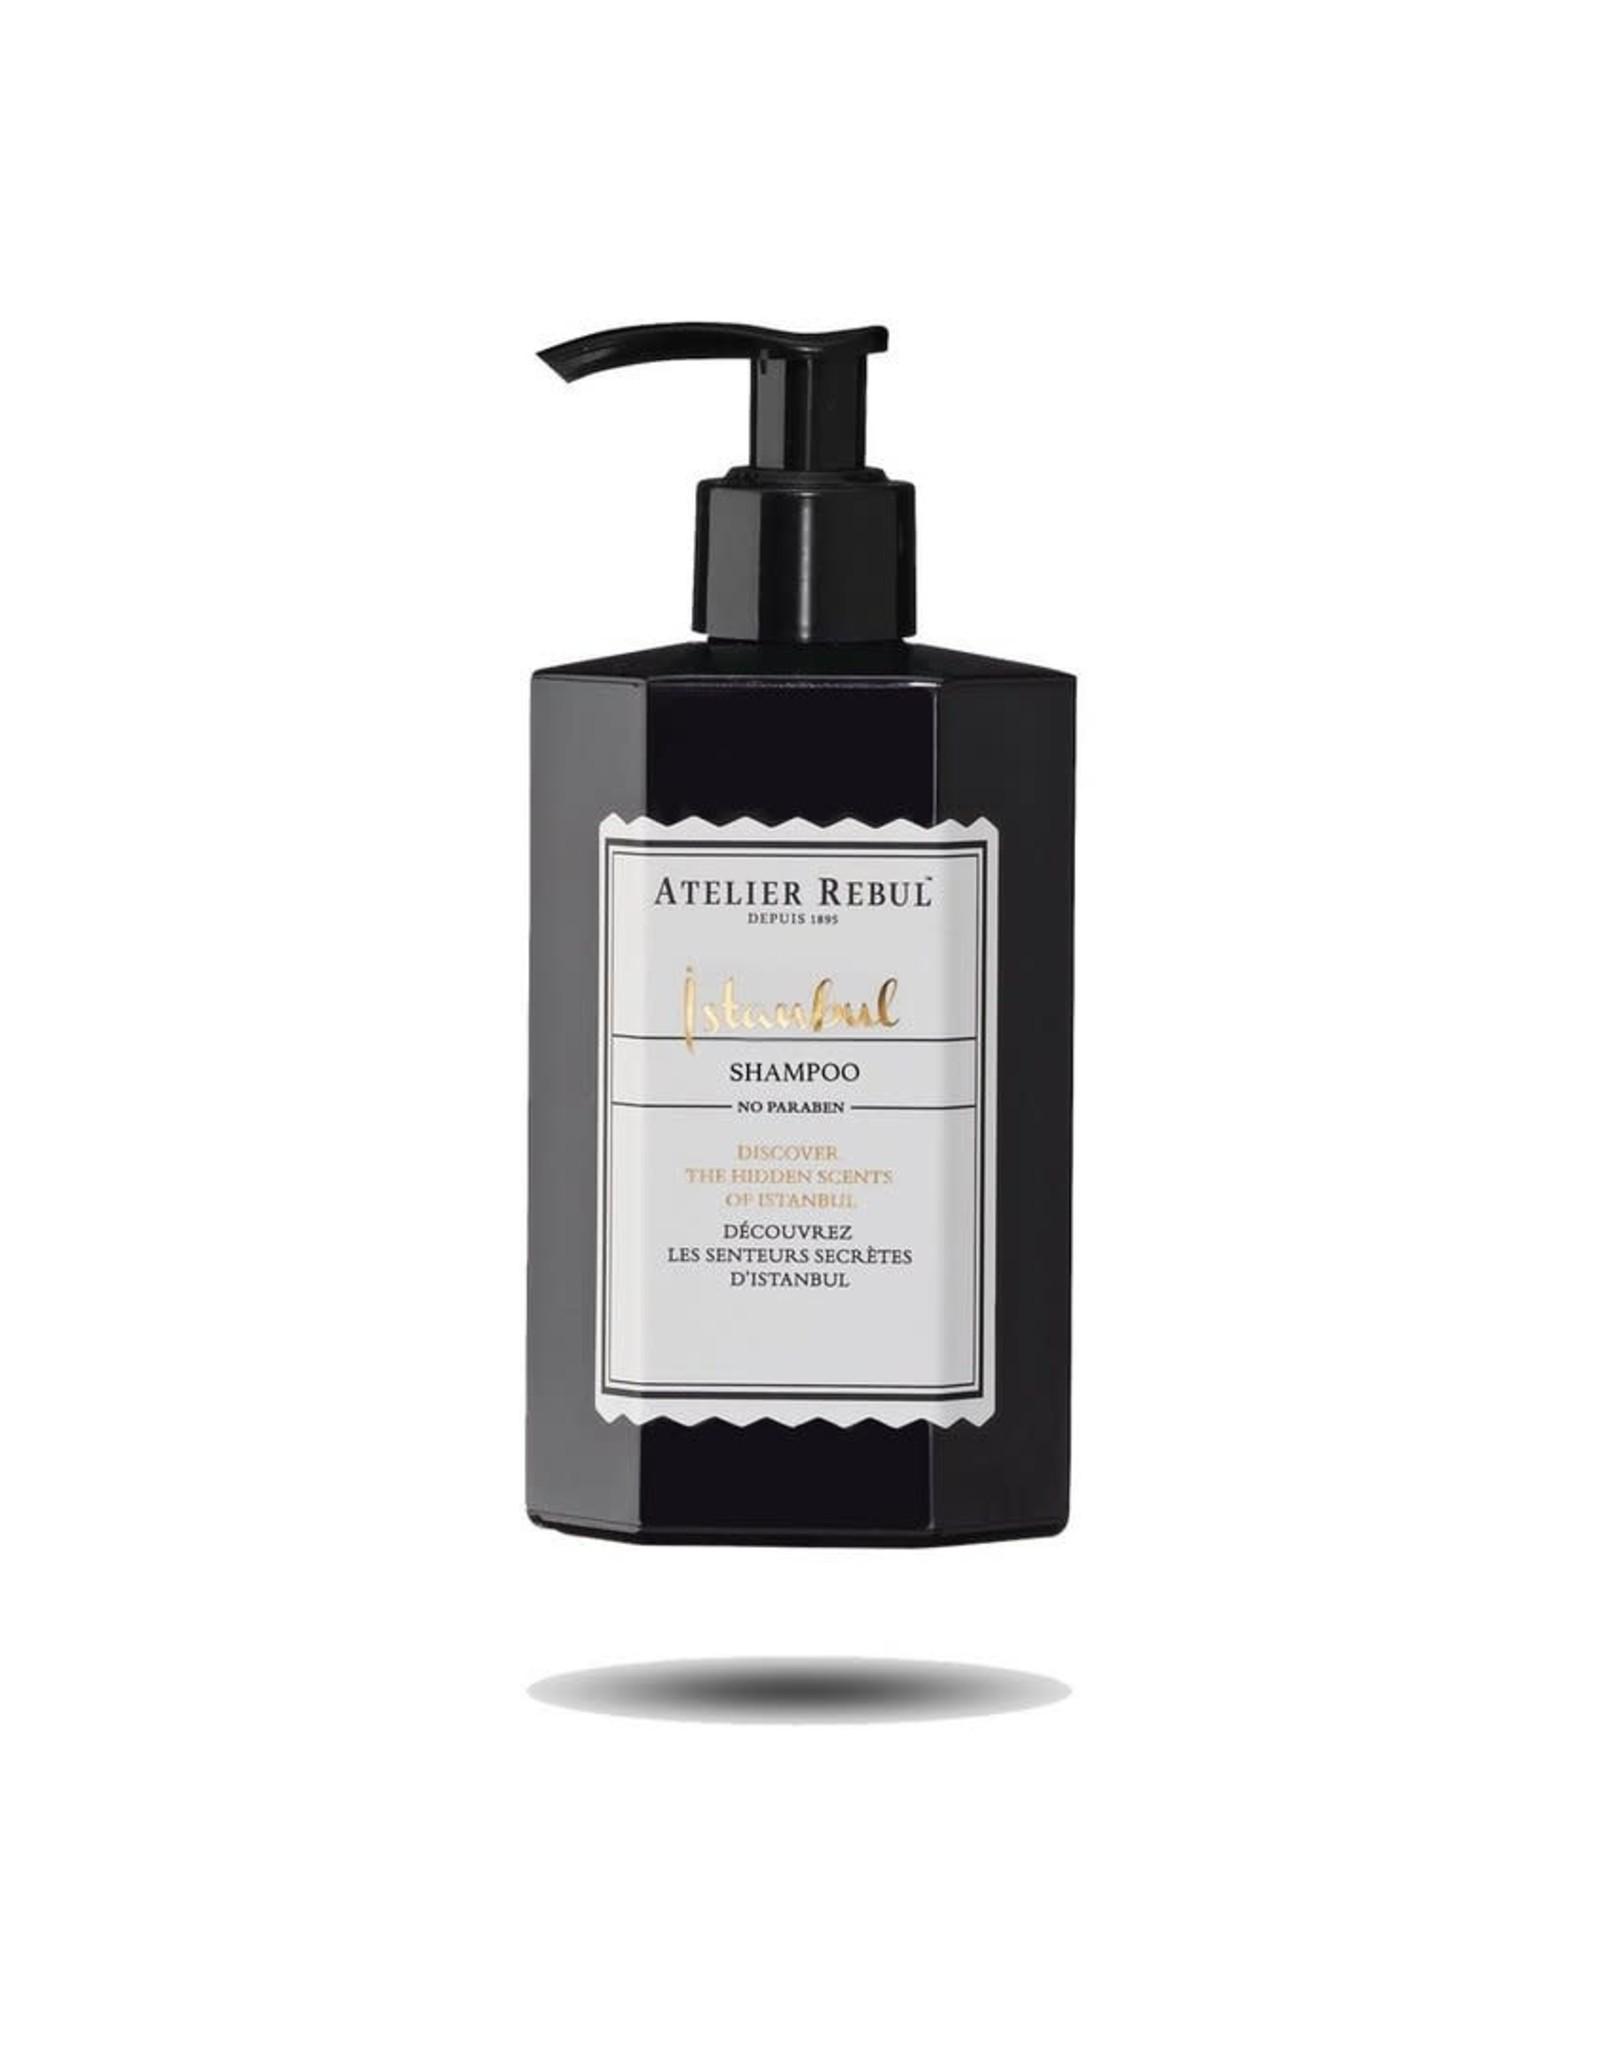 Atelier Rebul Atelier rebul - Istanbul shampoo 250ml